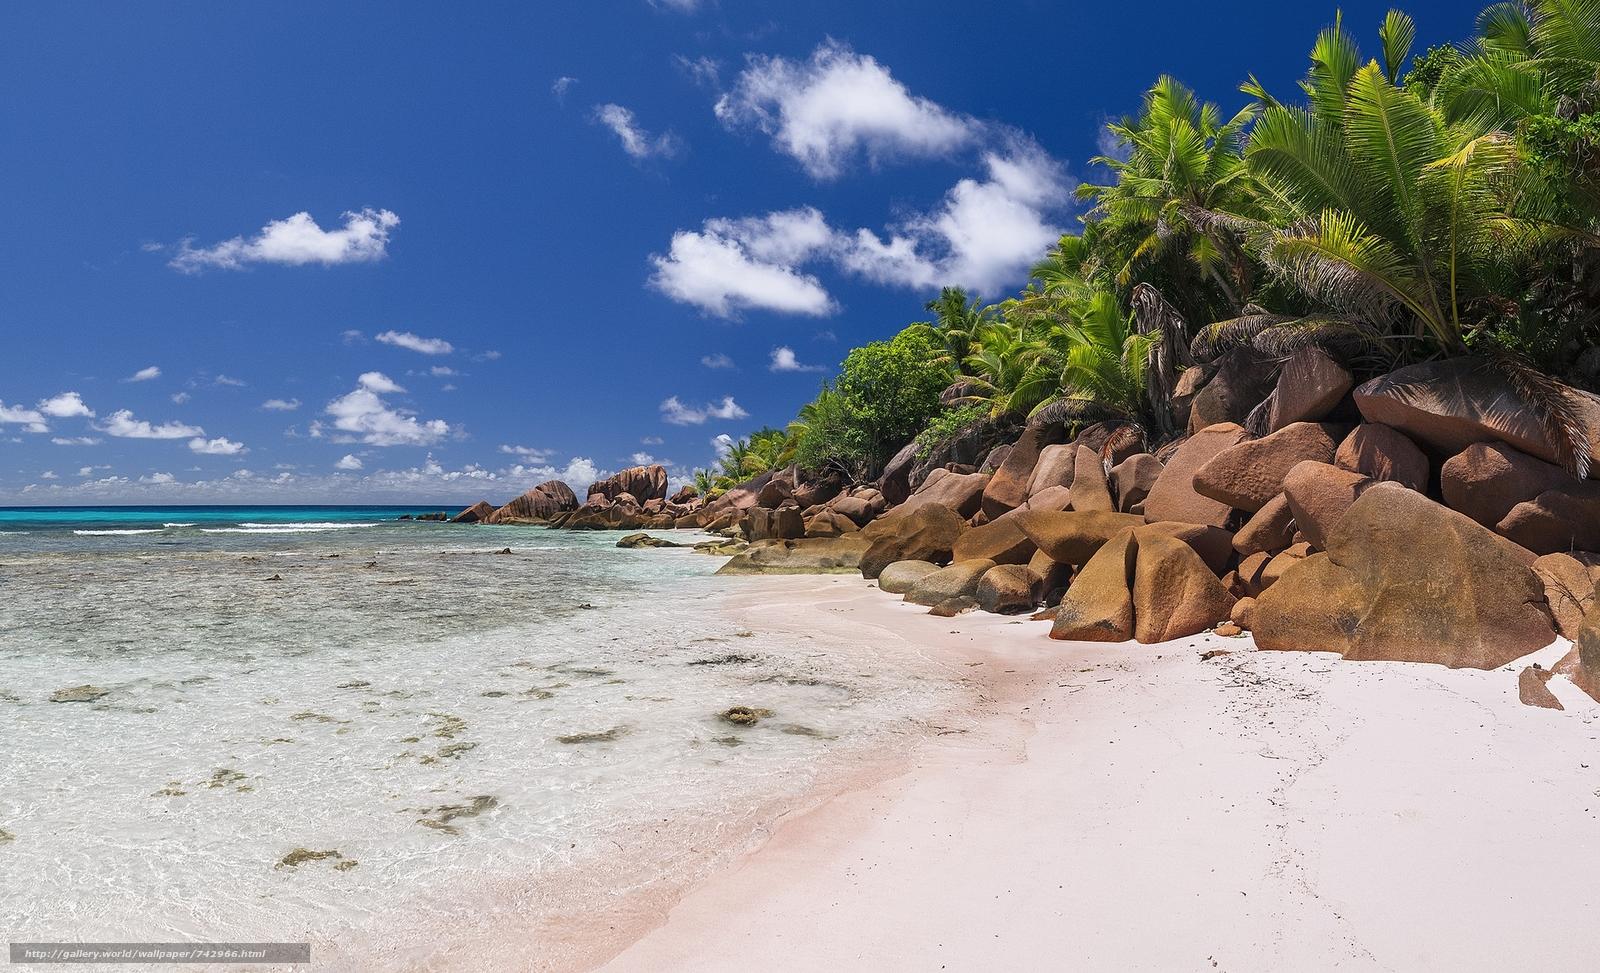 La Digue, Seychelles, sea, Island, Coast, palm trees, beach, landscape